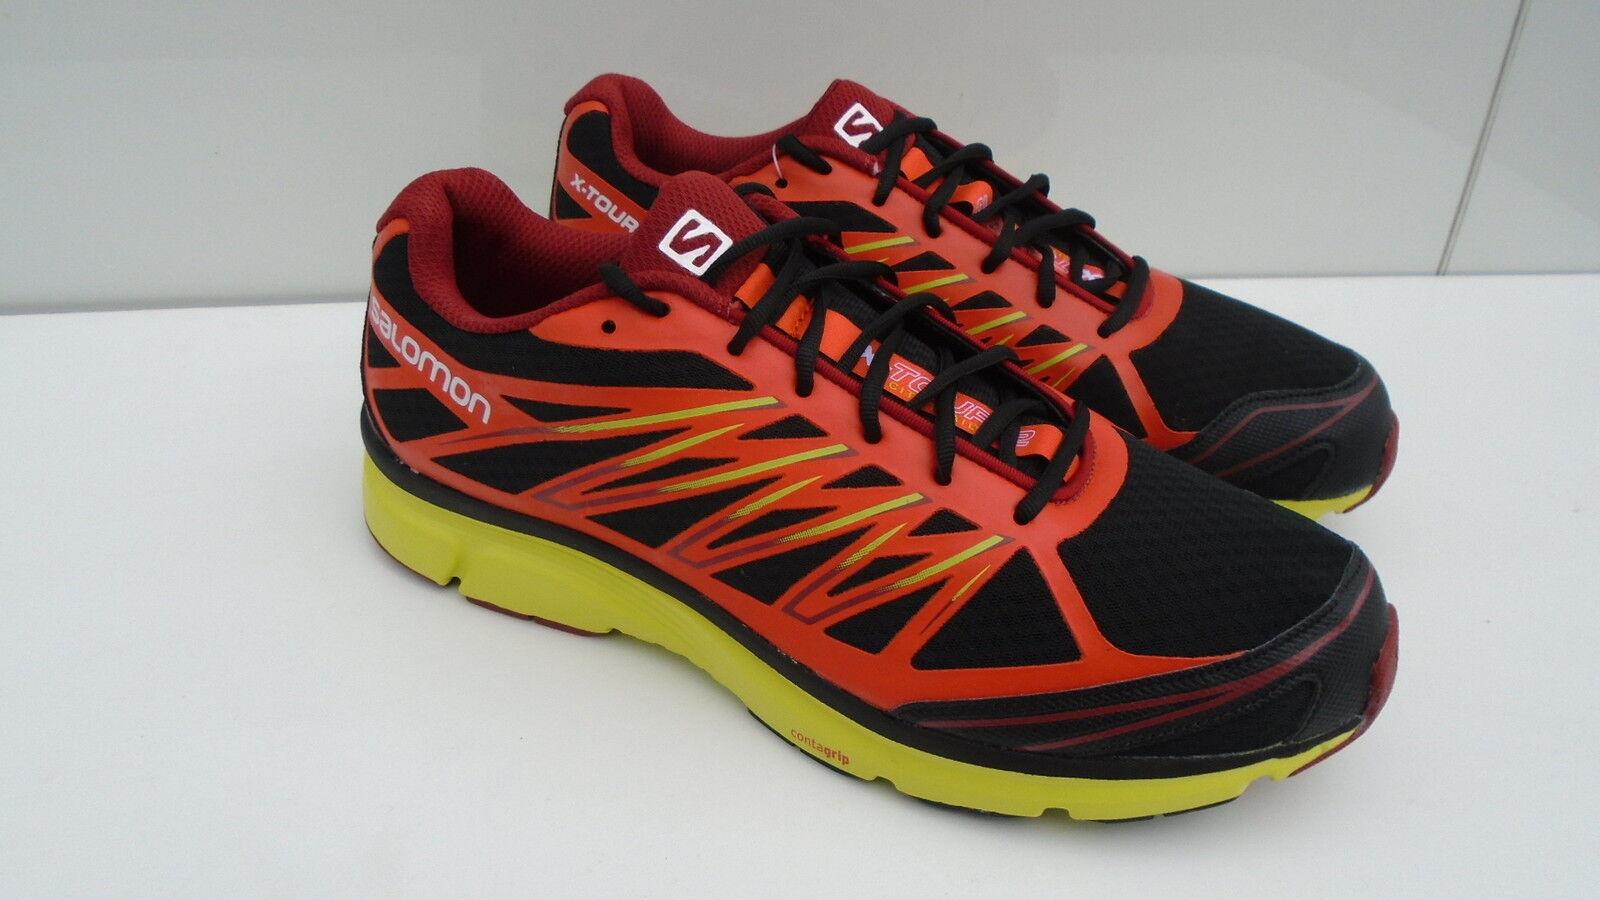 NEU Salomon X-Tour 2    Running Schuhe Laufschuhe Sneaker Herren Grösse 40 - 48